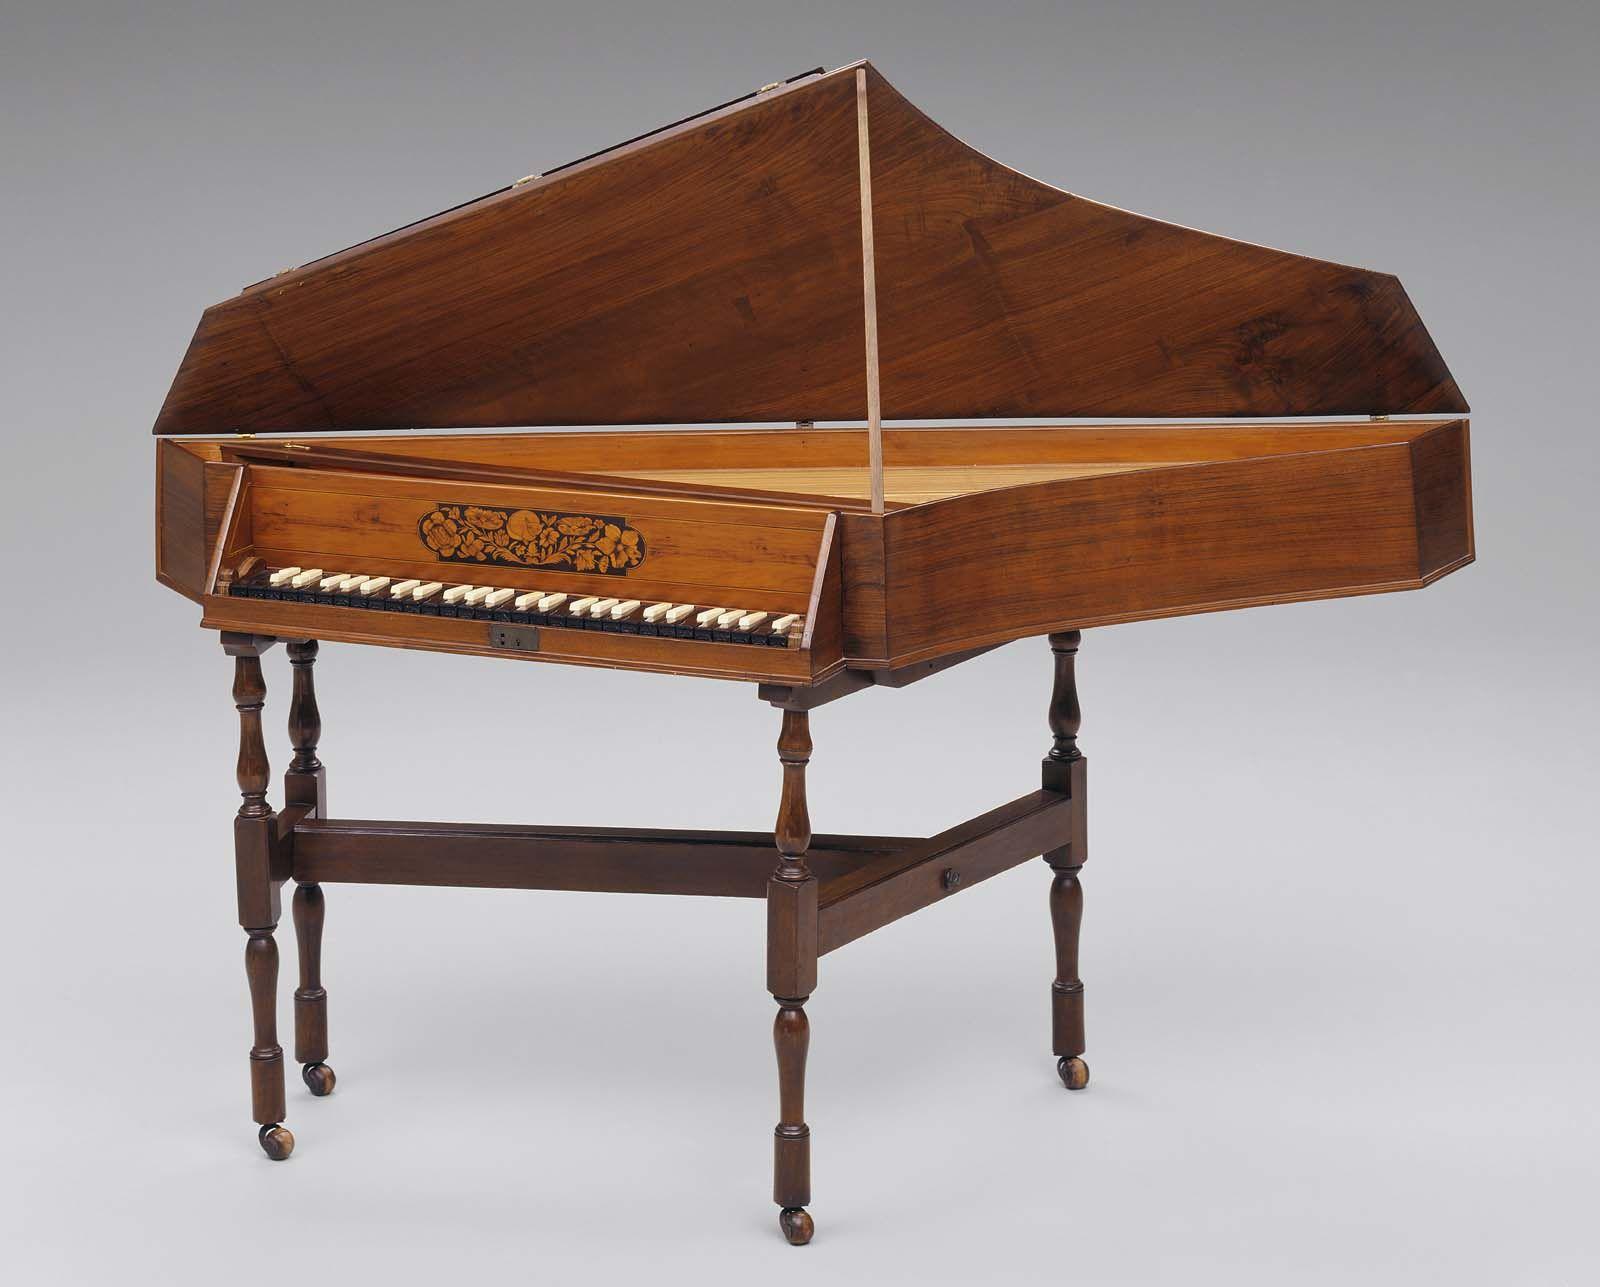 Musical Furniture Spinet By Stephen Keene English 1700 Mfa Boston Harpsichords